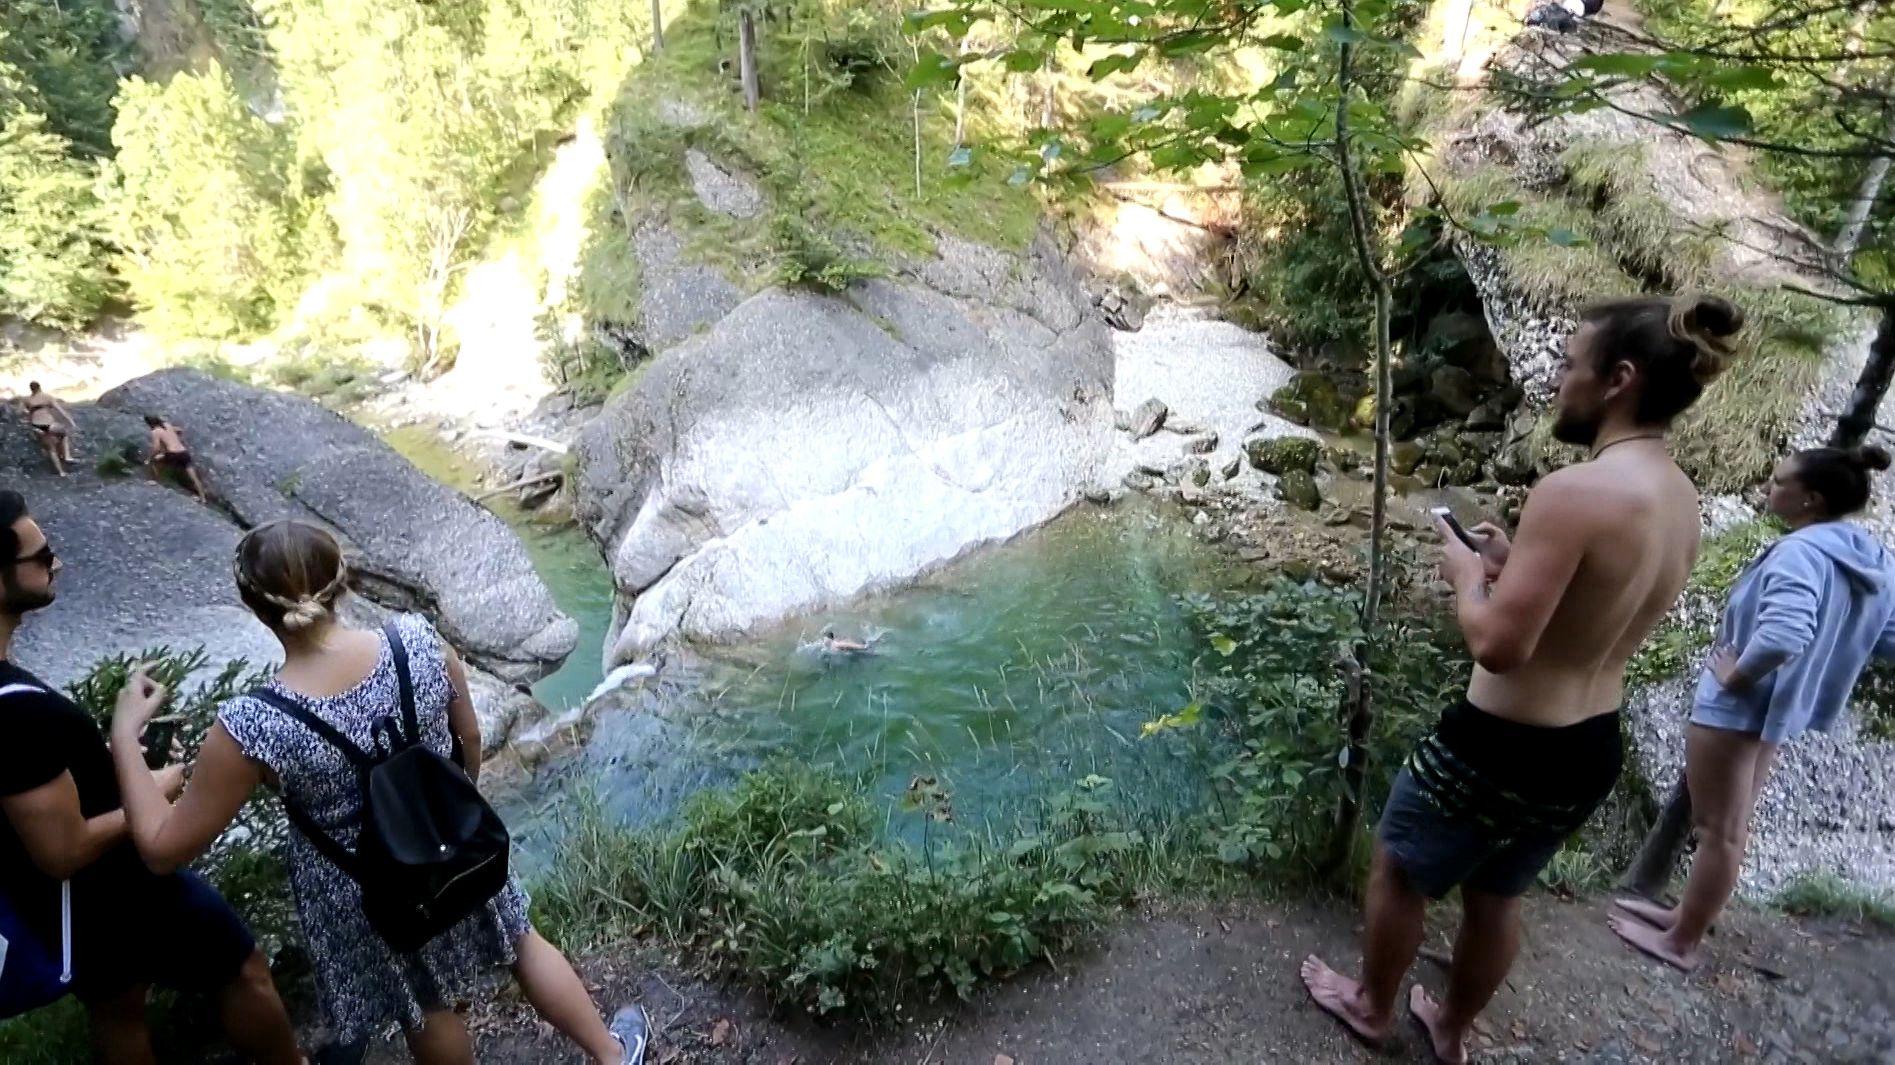 Gumpenspringer an den Buchenegger Wasserfällen im Allgäu